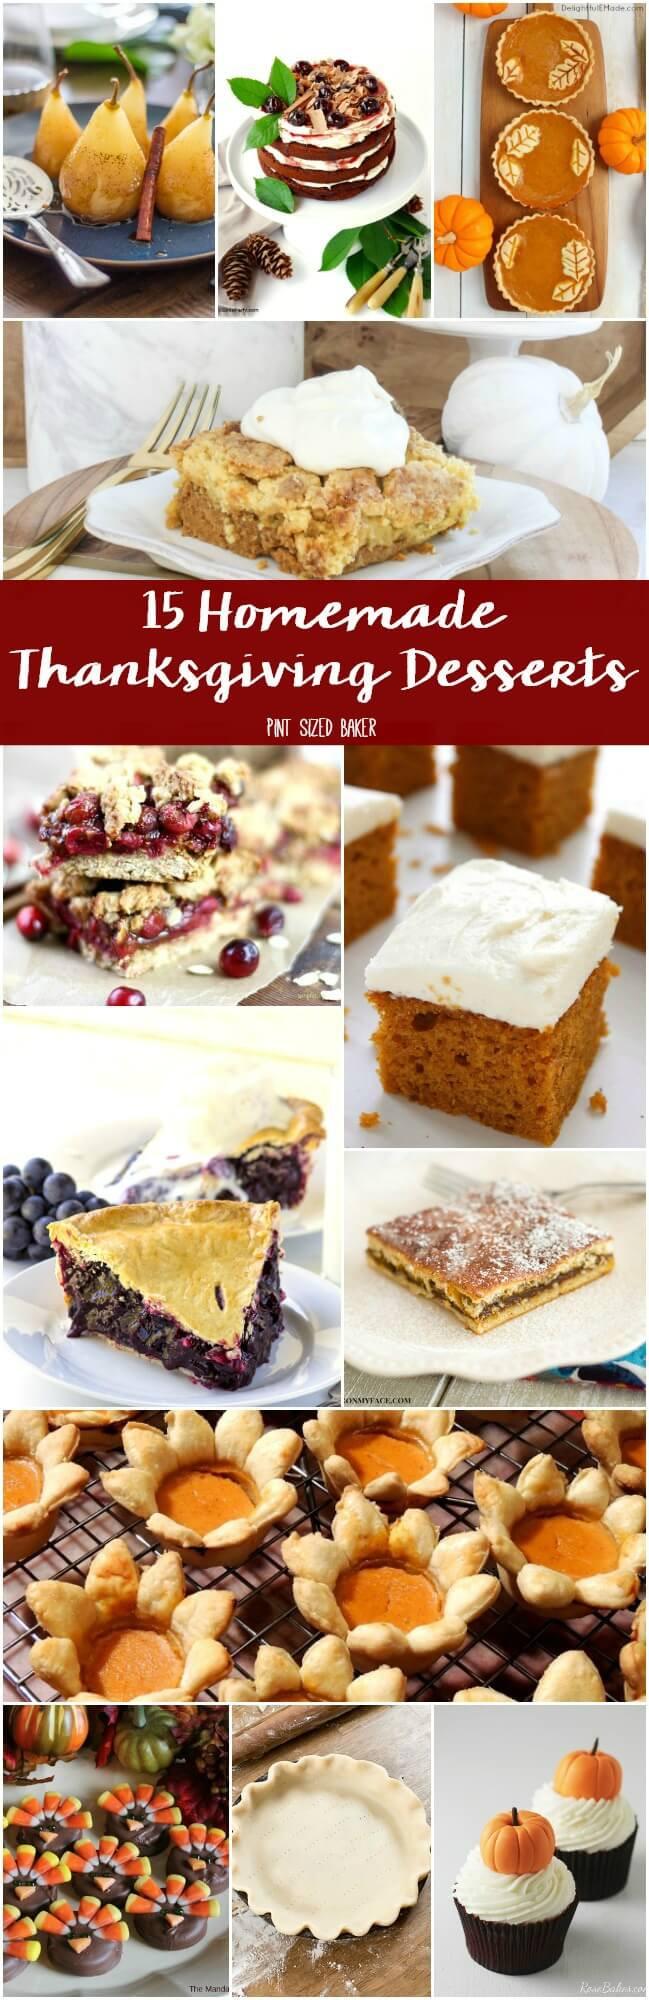 Diy Thanksgiving Desserts  Homemade Thanksgiving Desserts Pint Sized Baker